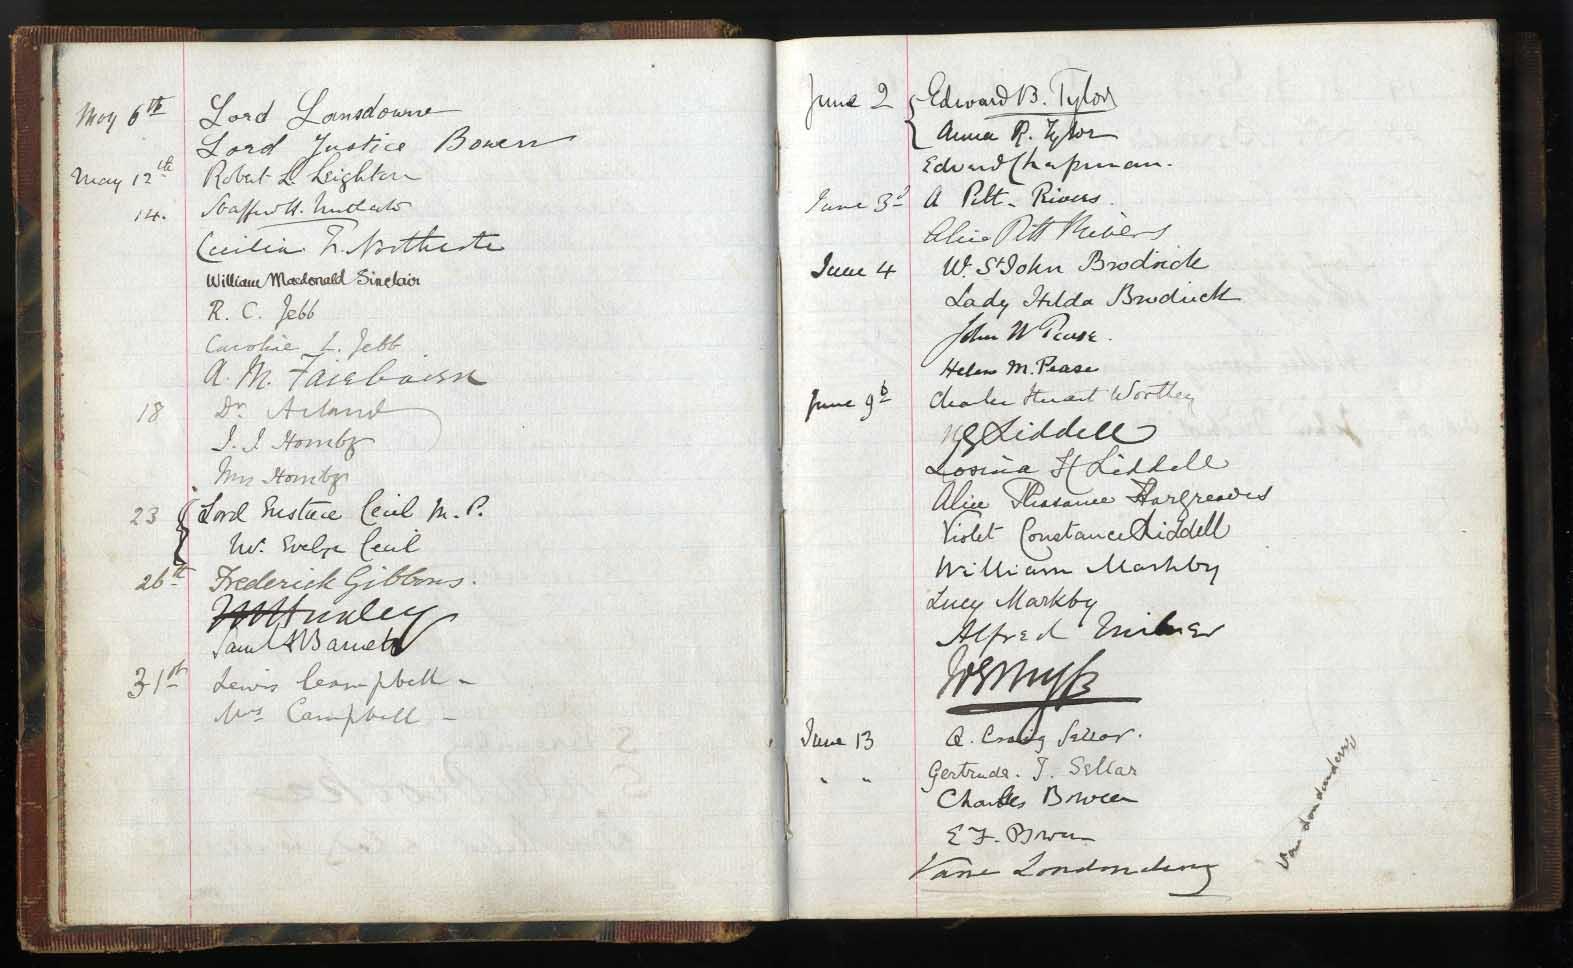 Guest book of Benjamin Jowett, Balliol Master, 1883